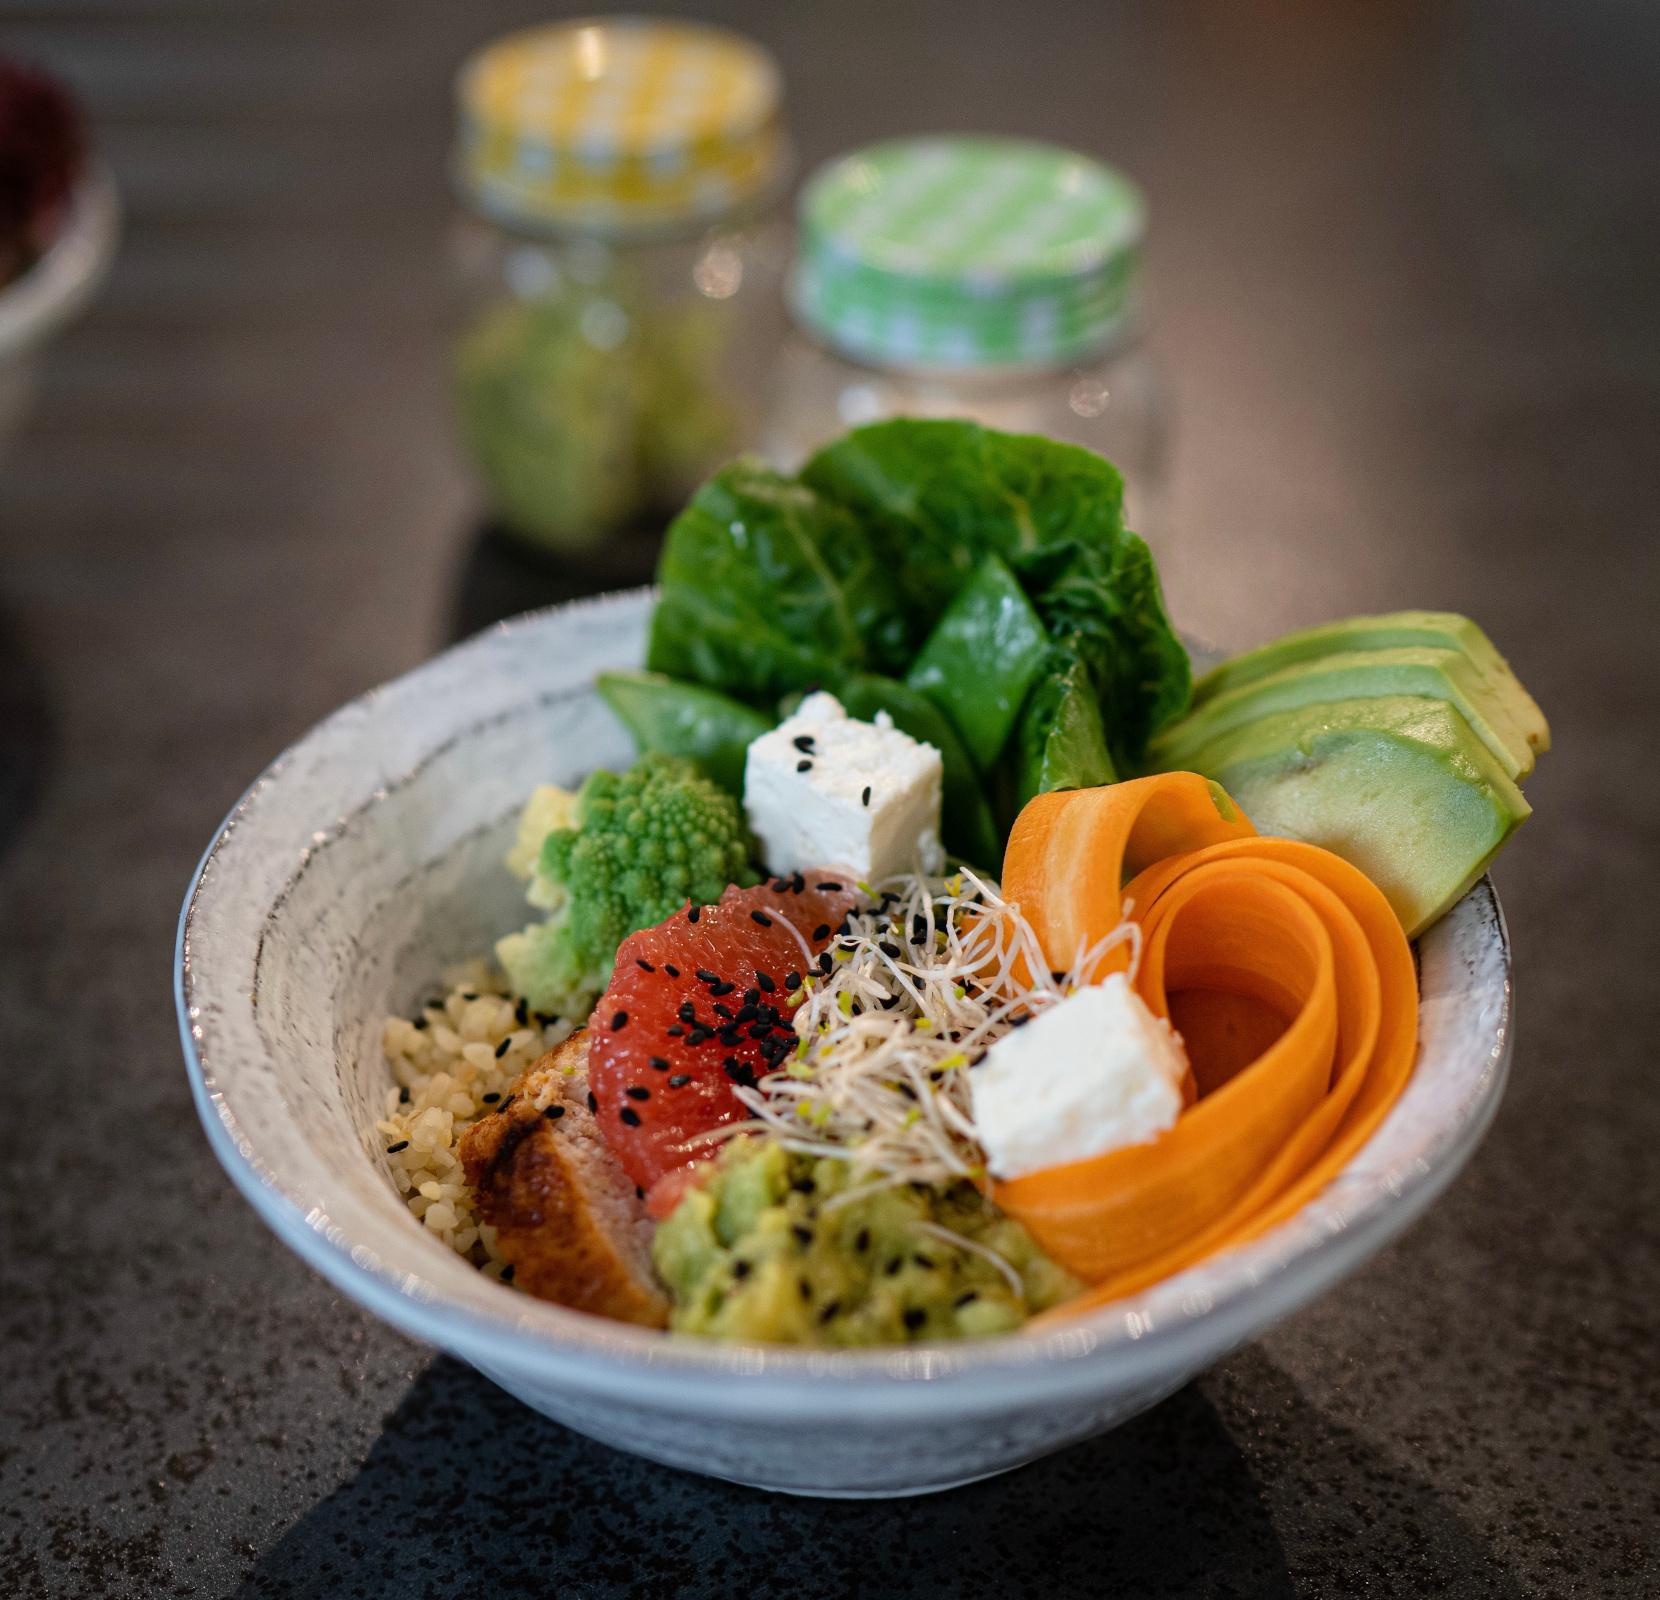 Meal-Prep_Bowl by Dr. Alexa Iwan